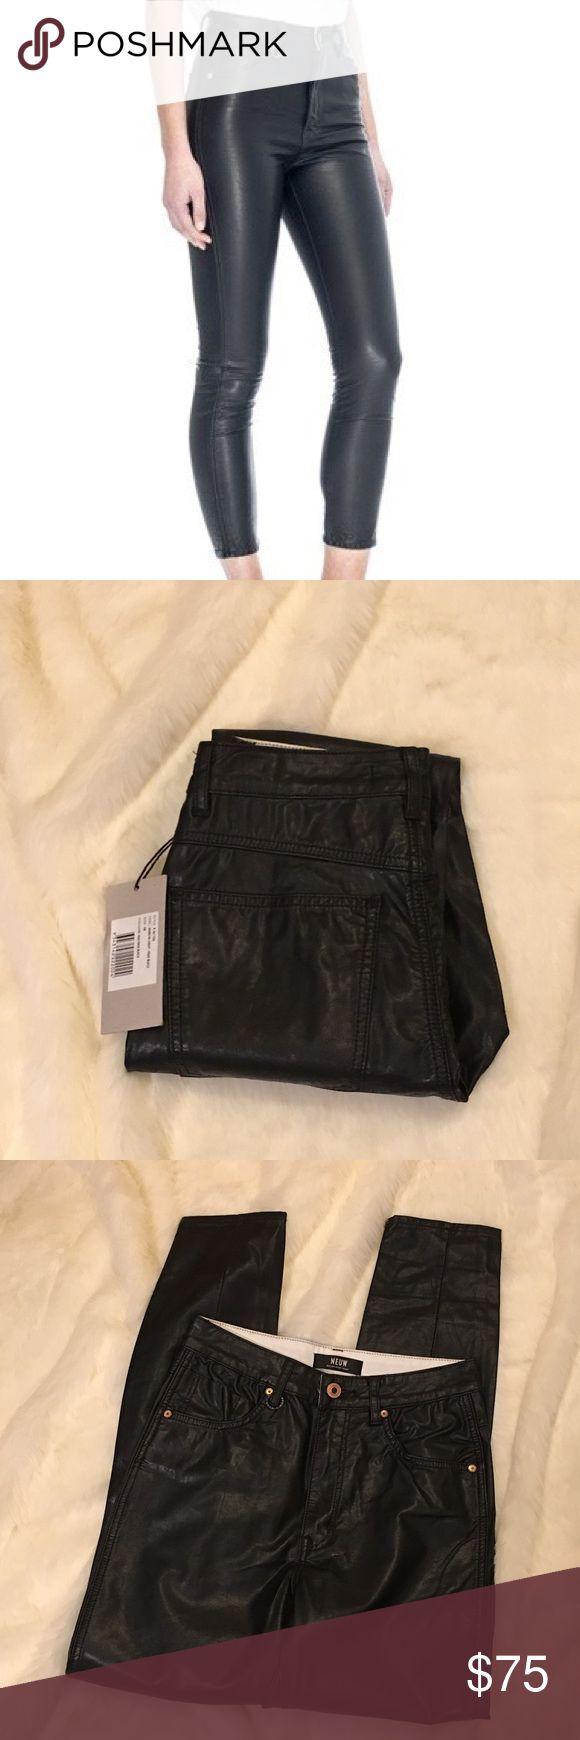 NWT Neuw Marilyn Skinny Cropped Faux Leather Pants NWT Neuw Marilyn Skinny Cropped Faux Leather Pants Neuw Pants Skinny